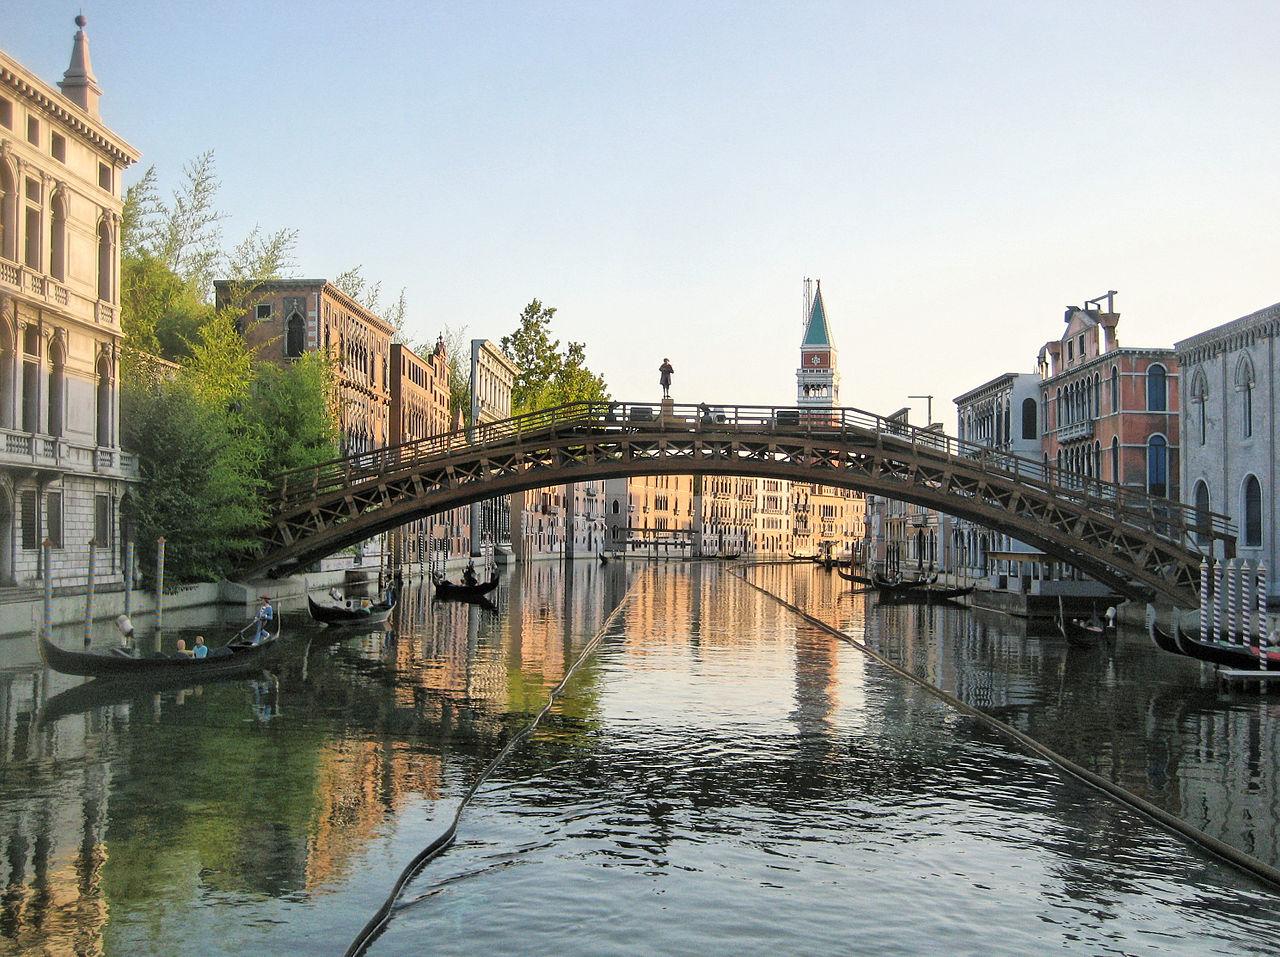 Италия в миниатюре, канал Венеции